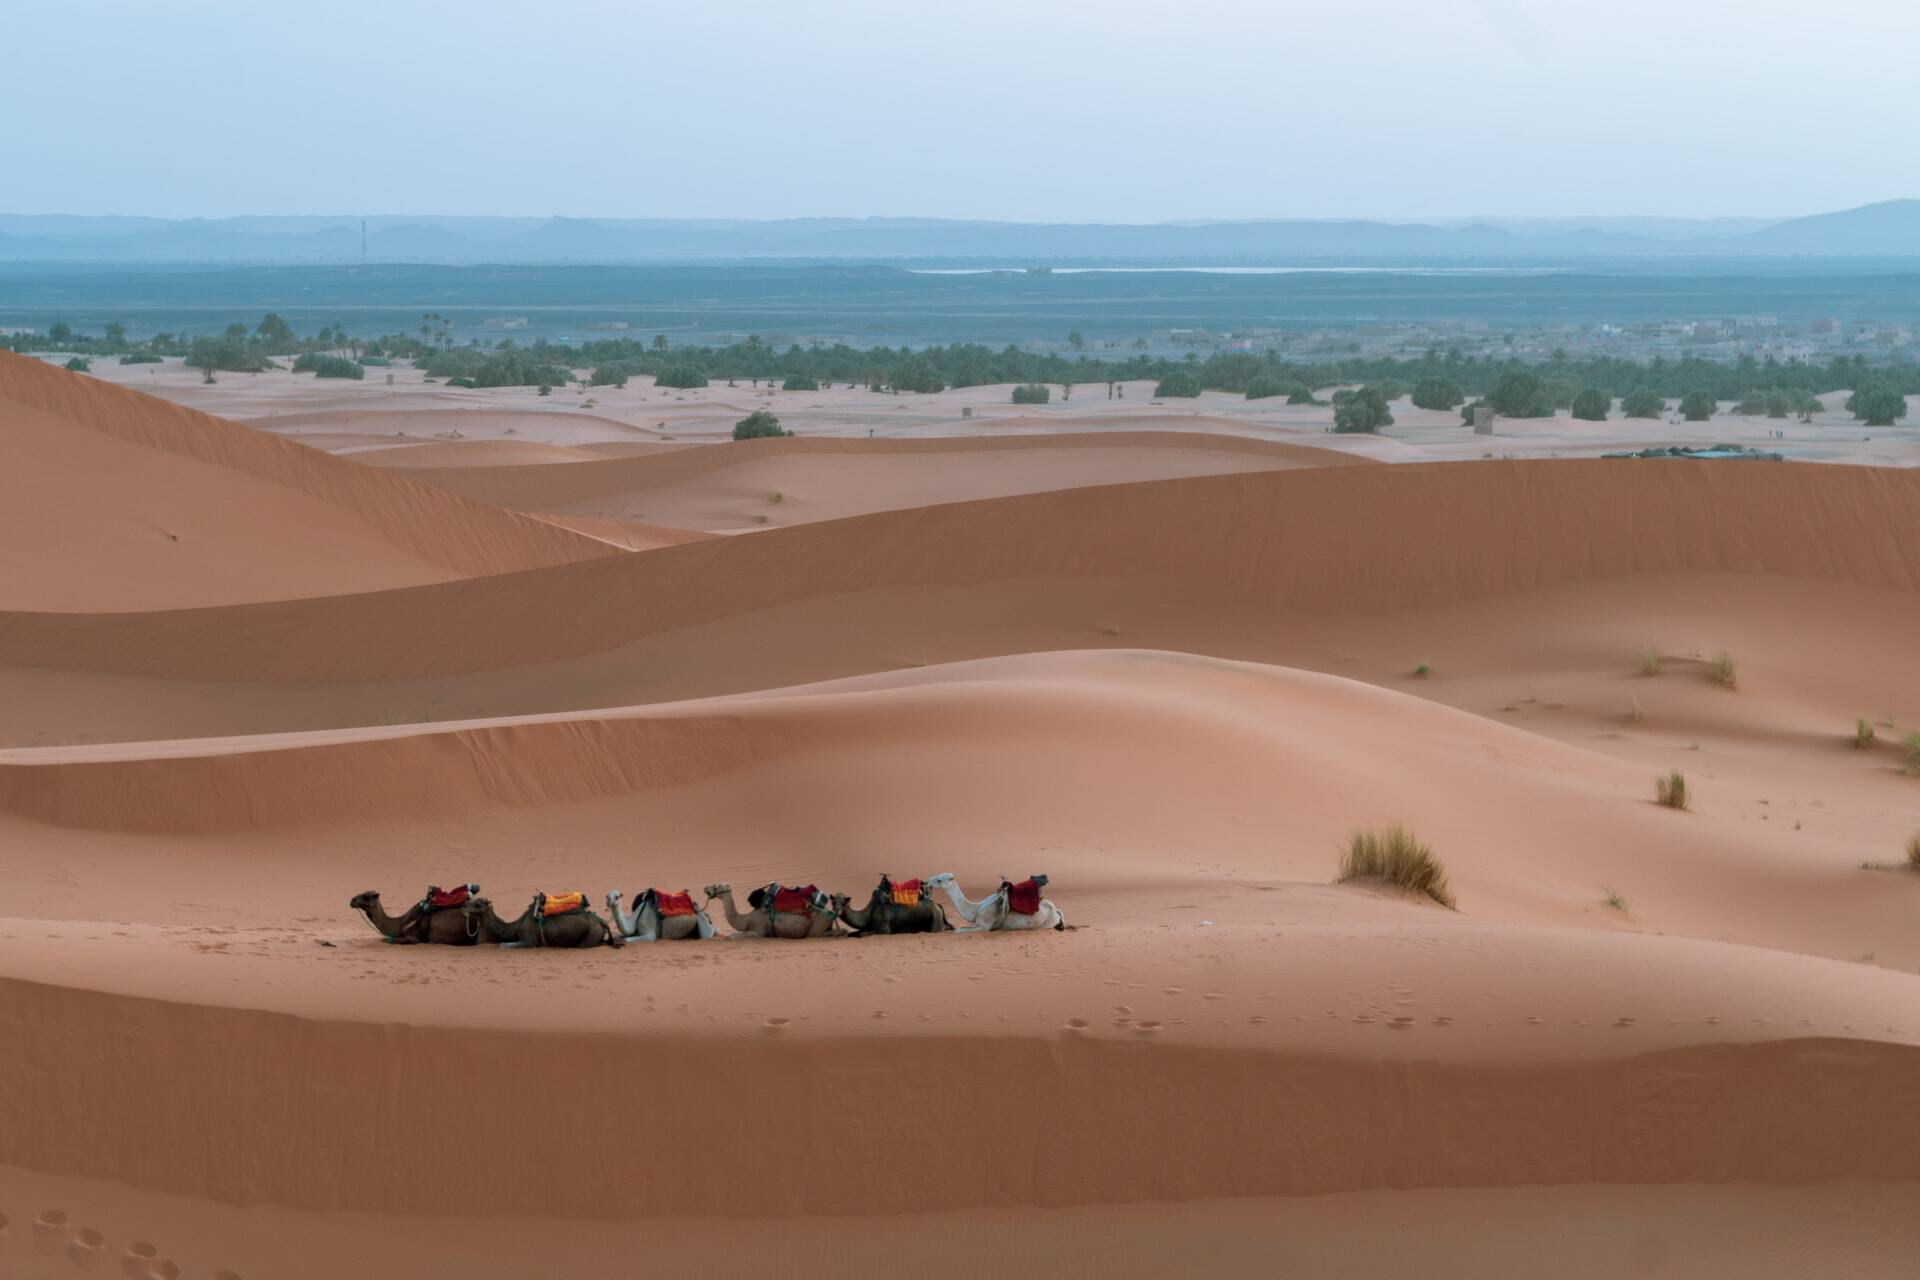 Camels caravan in Merzouga desert